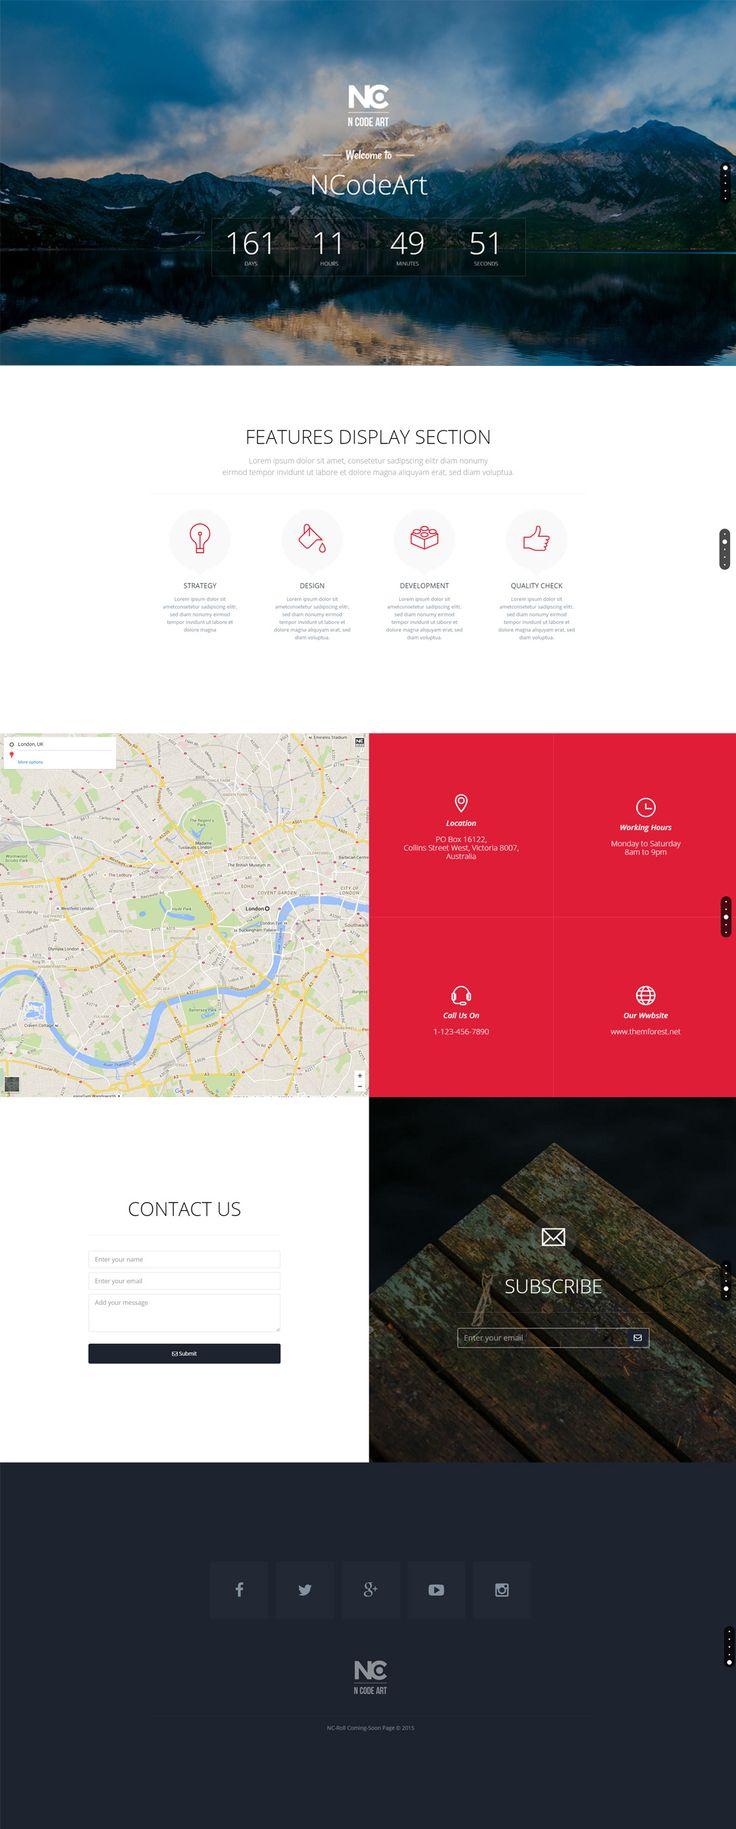 50 besten HTML Coming Soon Template Bilder auf Pinterest | Bau, Mock ...